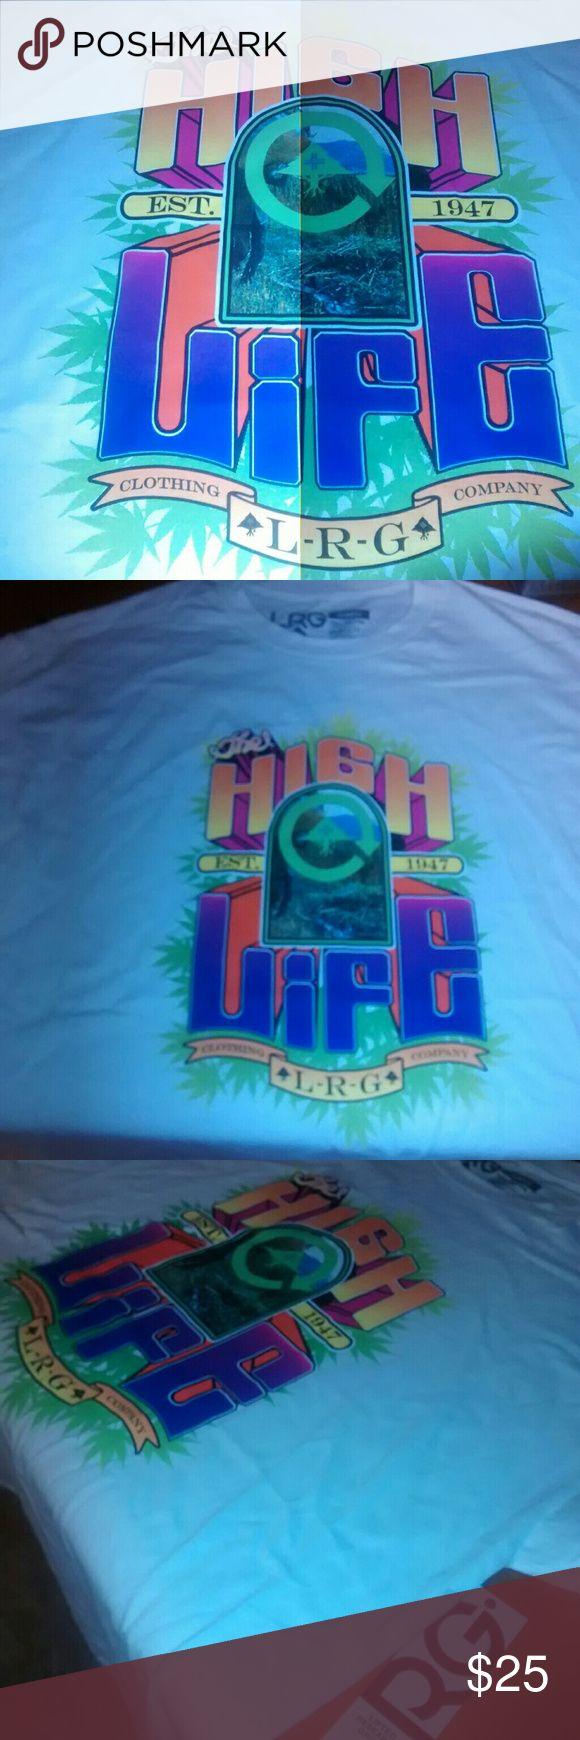 LRG T-Shirt High Life  Black light friendly  Brand new Never worn Lrg Shirts